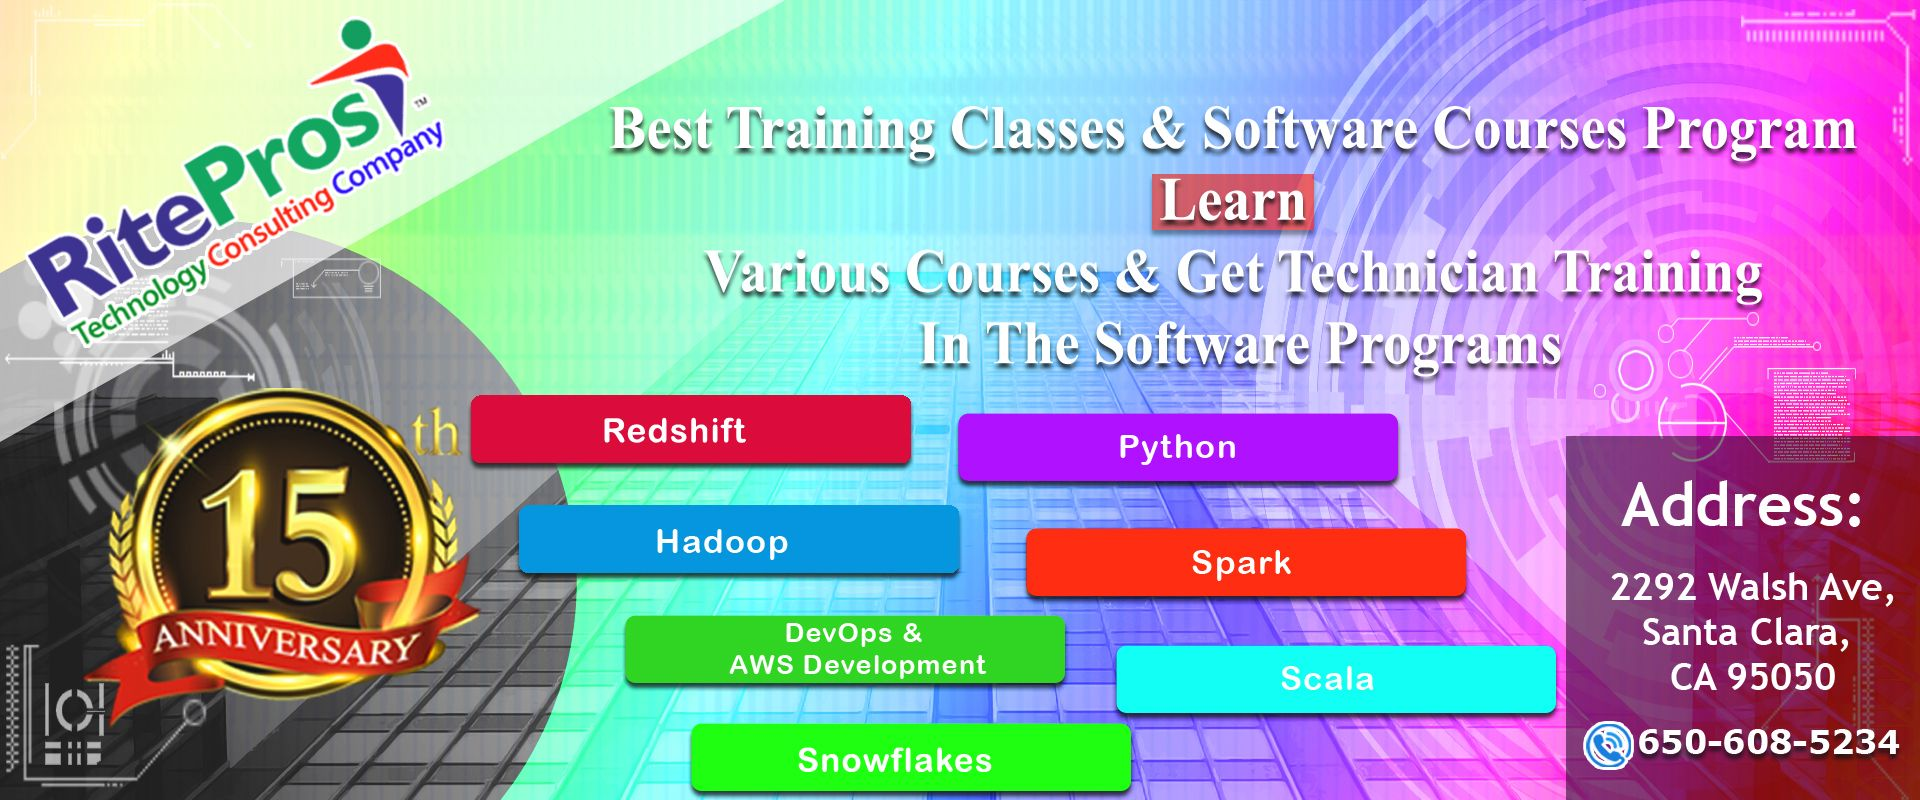 Best Training Classes Software Courses Program Learn Various Courses Training Classes Corporate Training Software